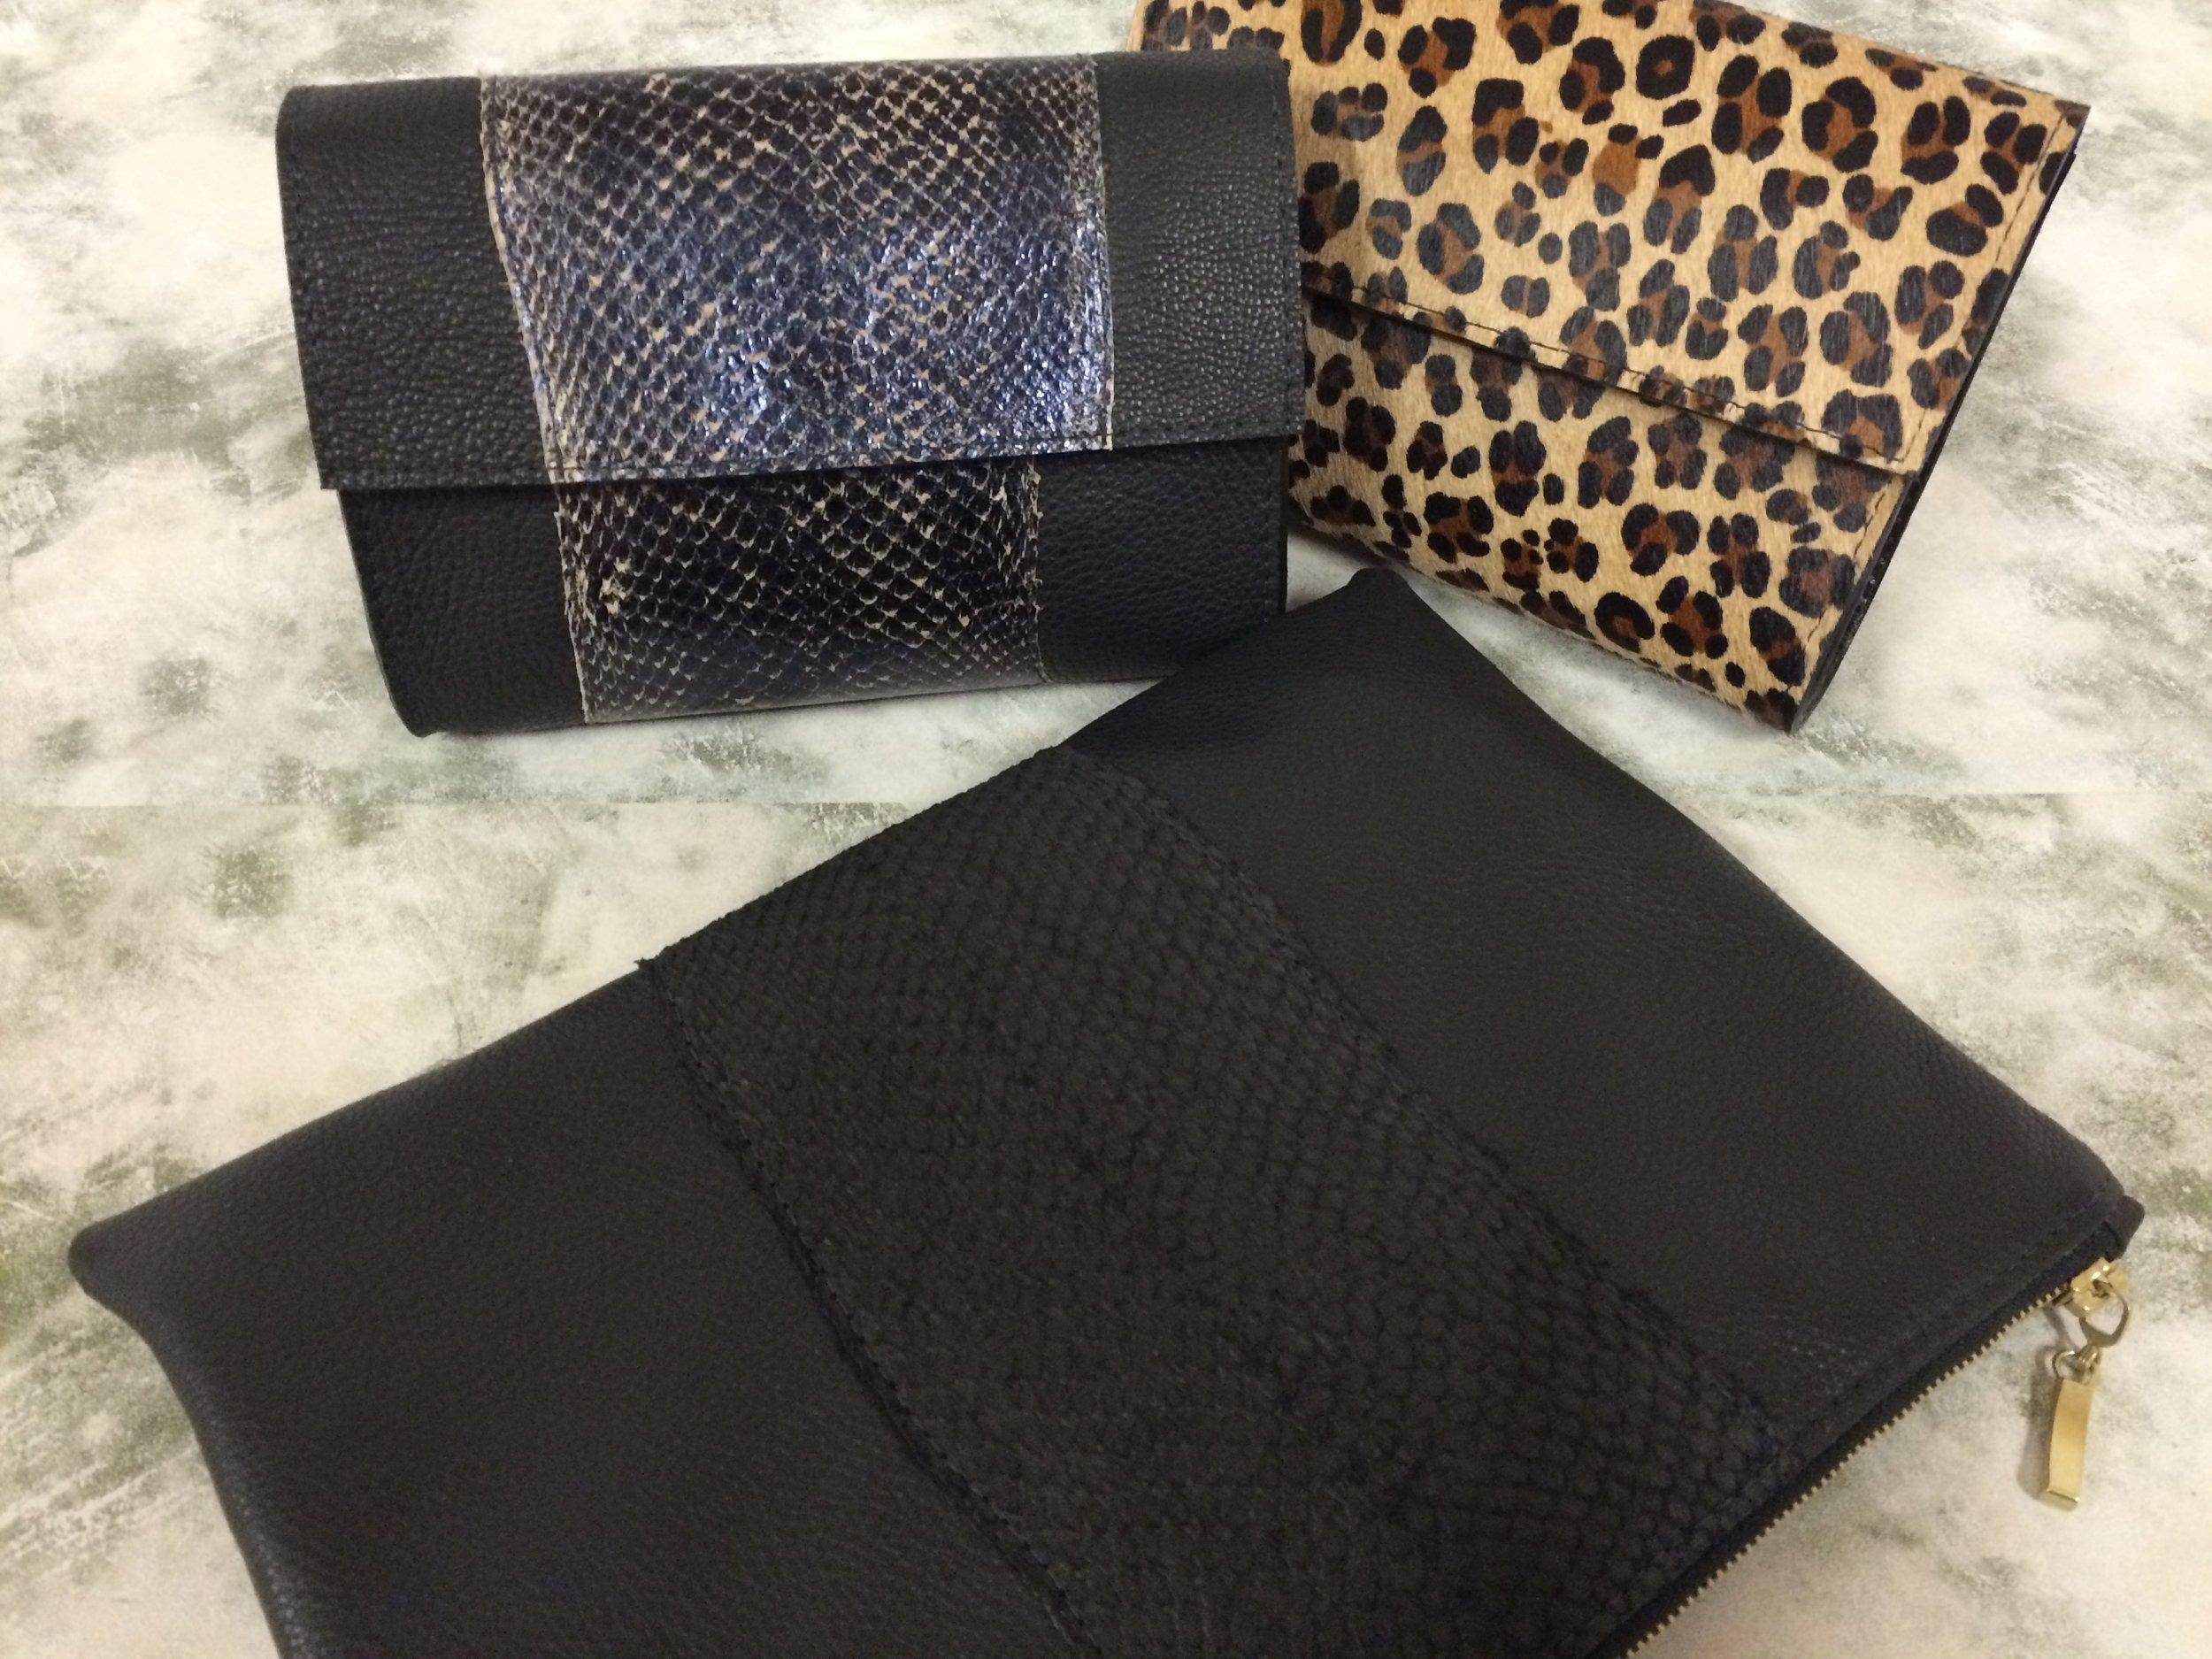 Bronagh Holmes Luxury - Arina-Black Salmon - Avani-Snake Effect - Avani-Leopard Print